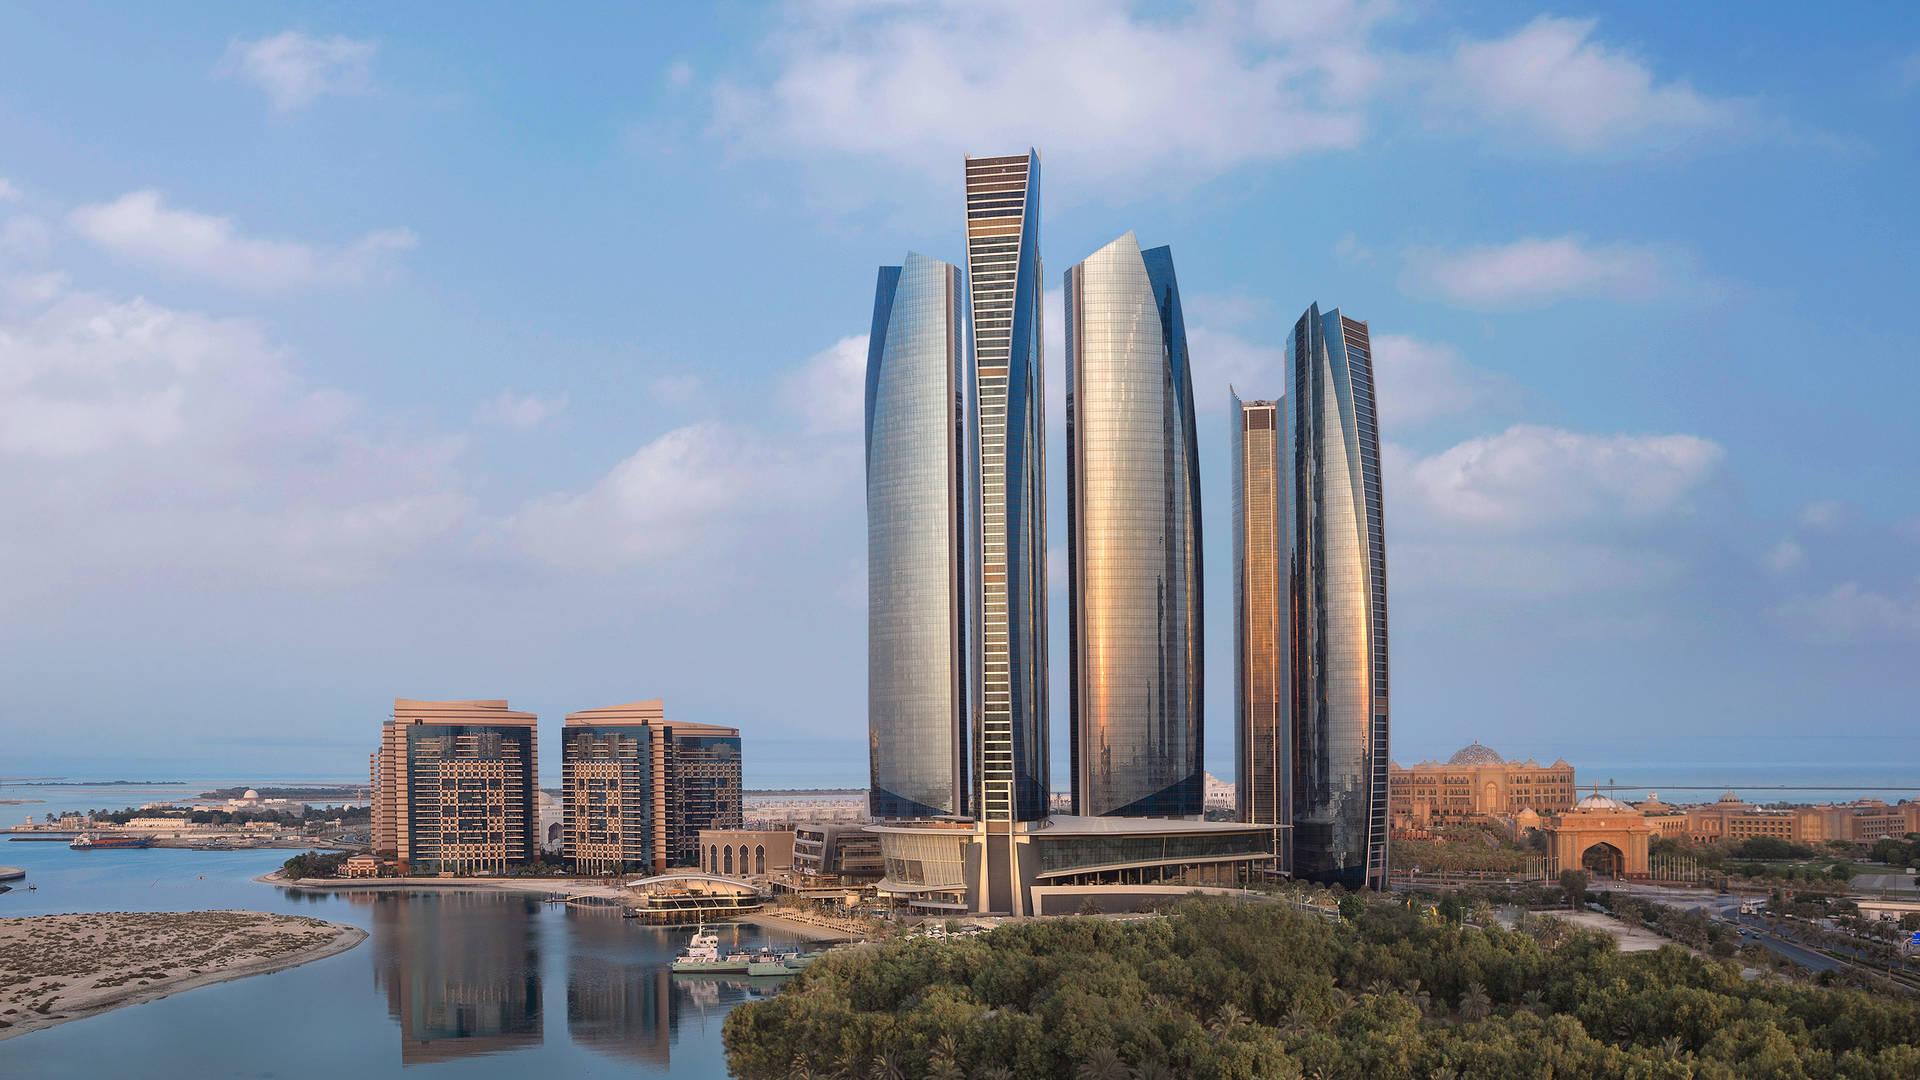 Отель Jumeirah at Etihad Towers — архитектурный облик_16-9